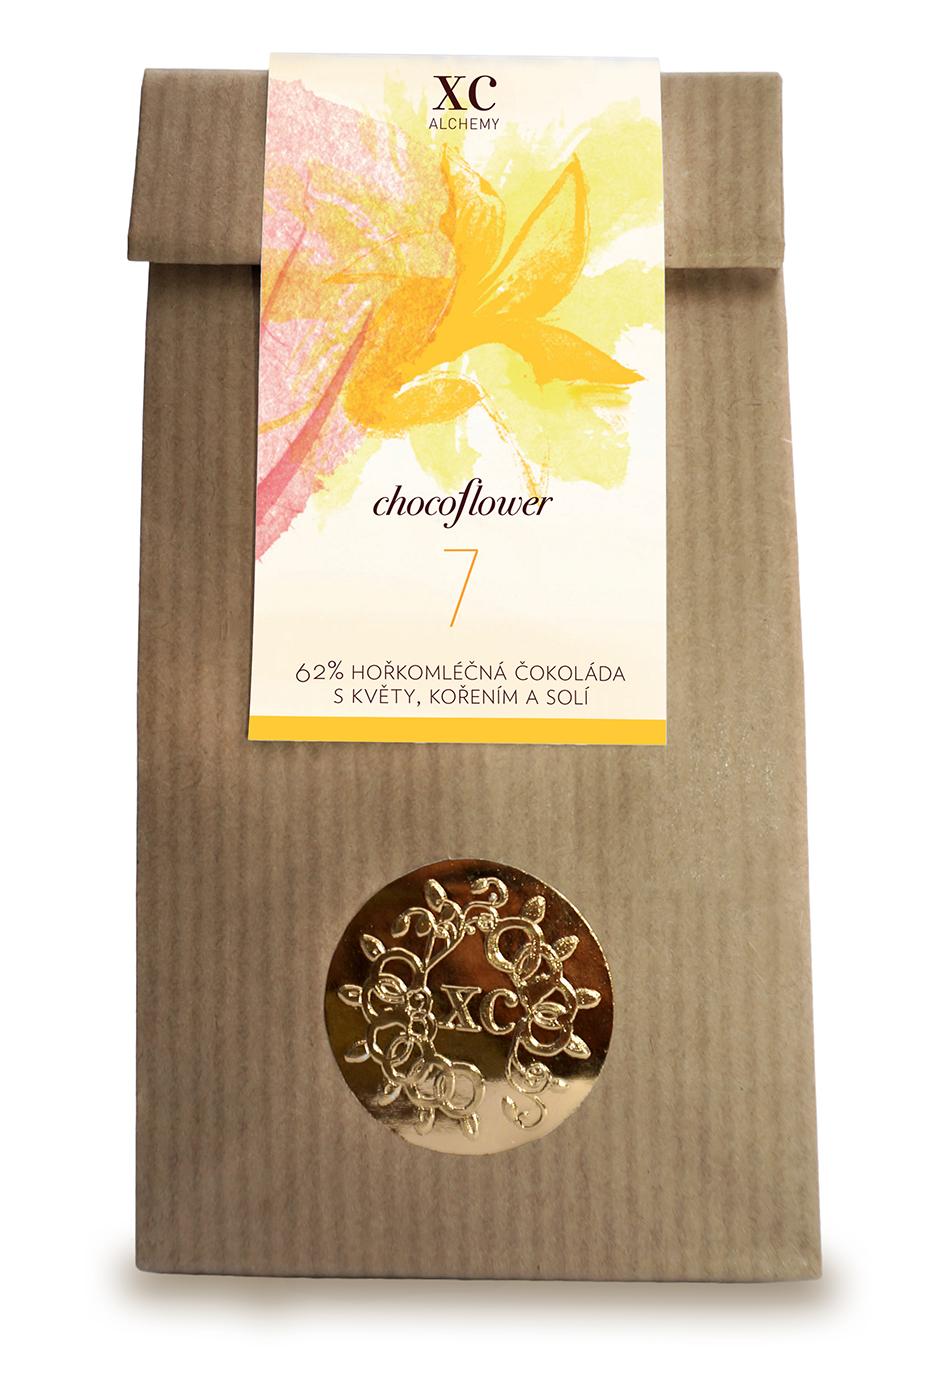 xc chocoflower 7 L